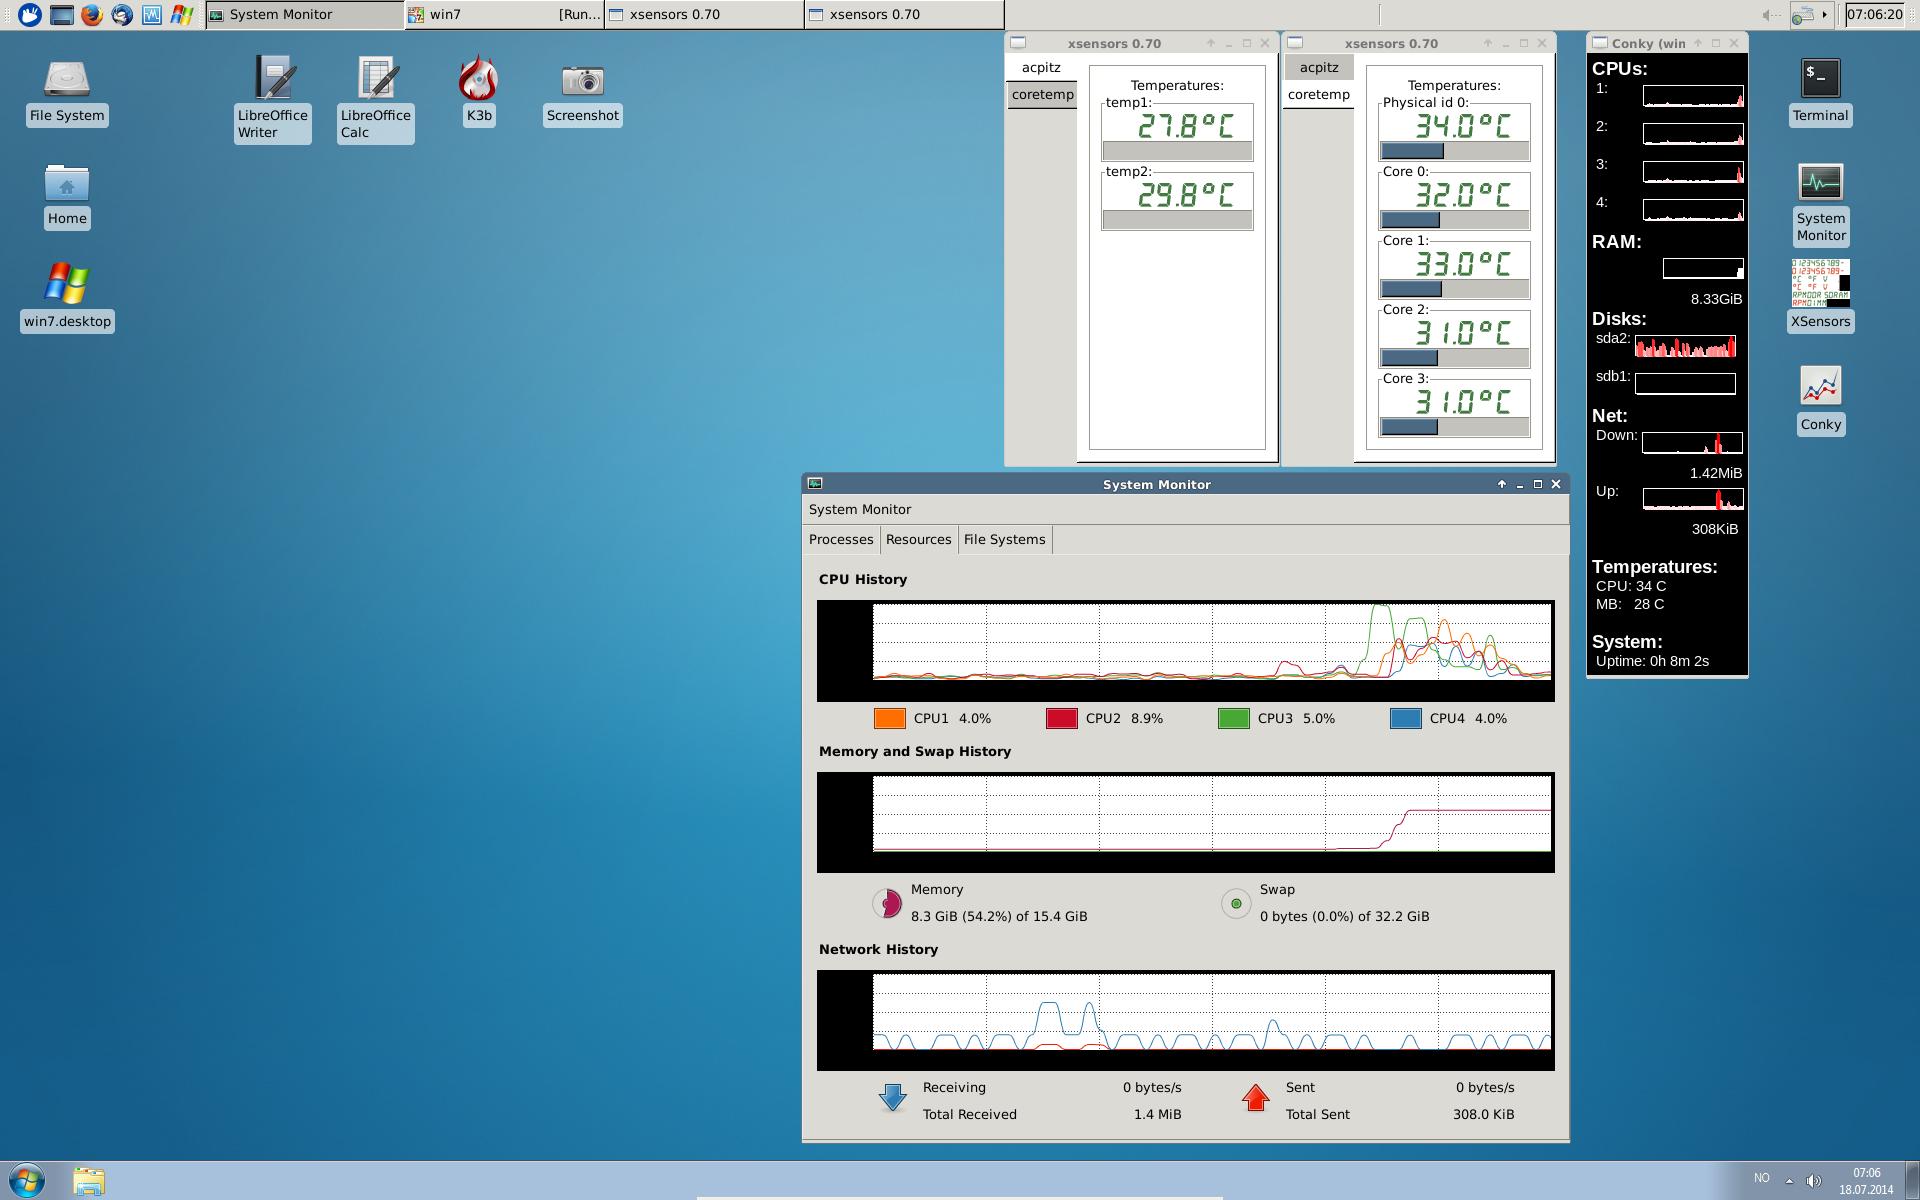 download mcse windows 2000